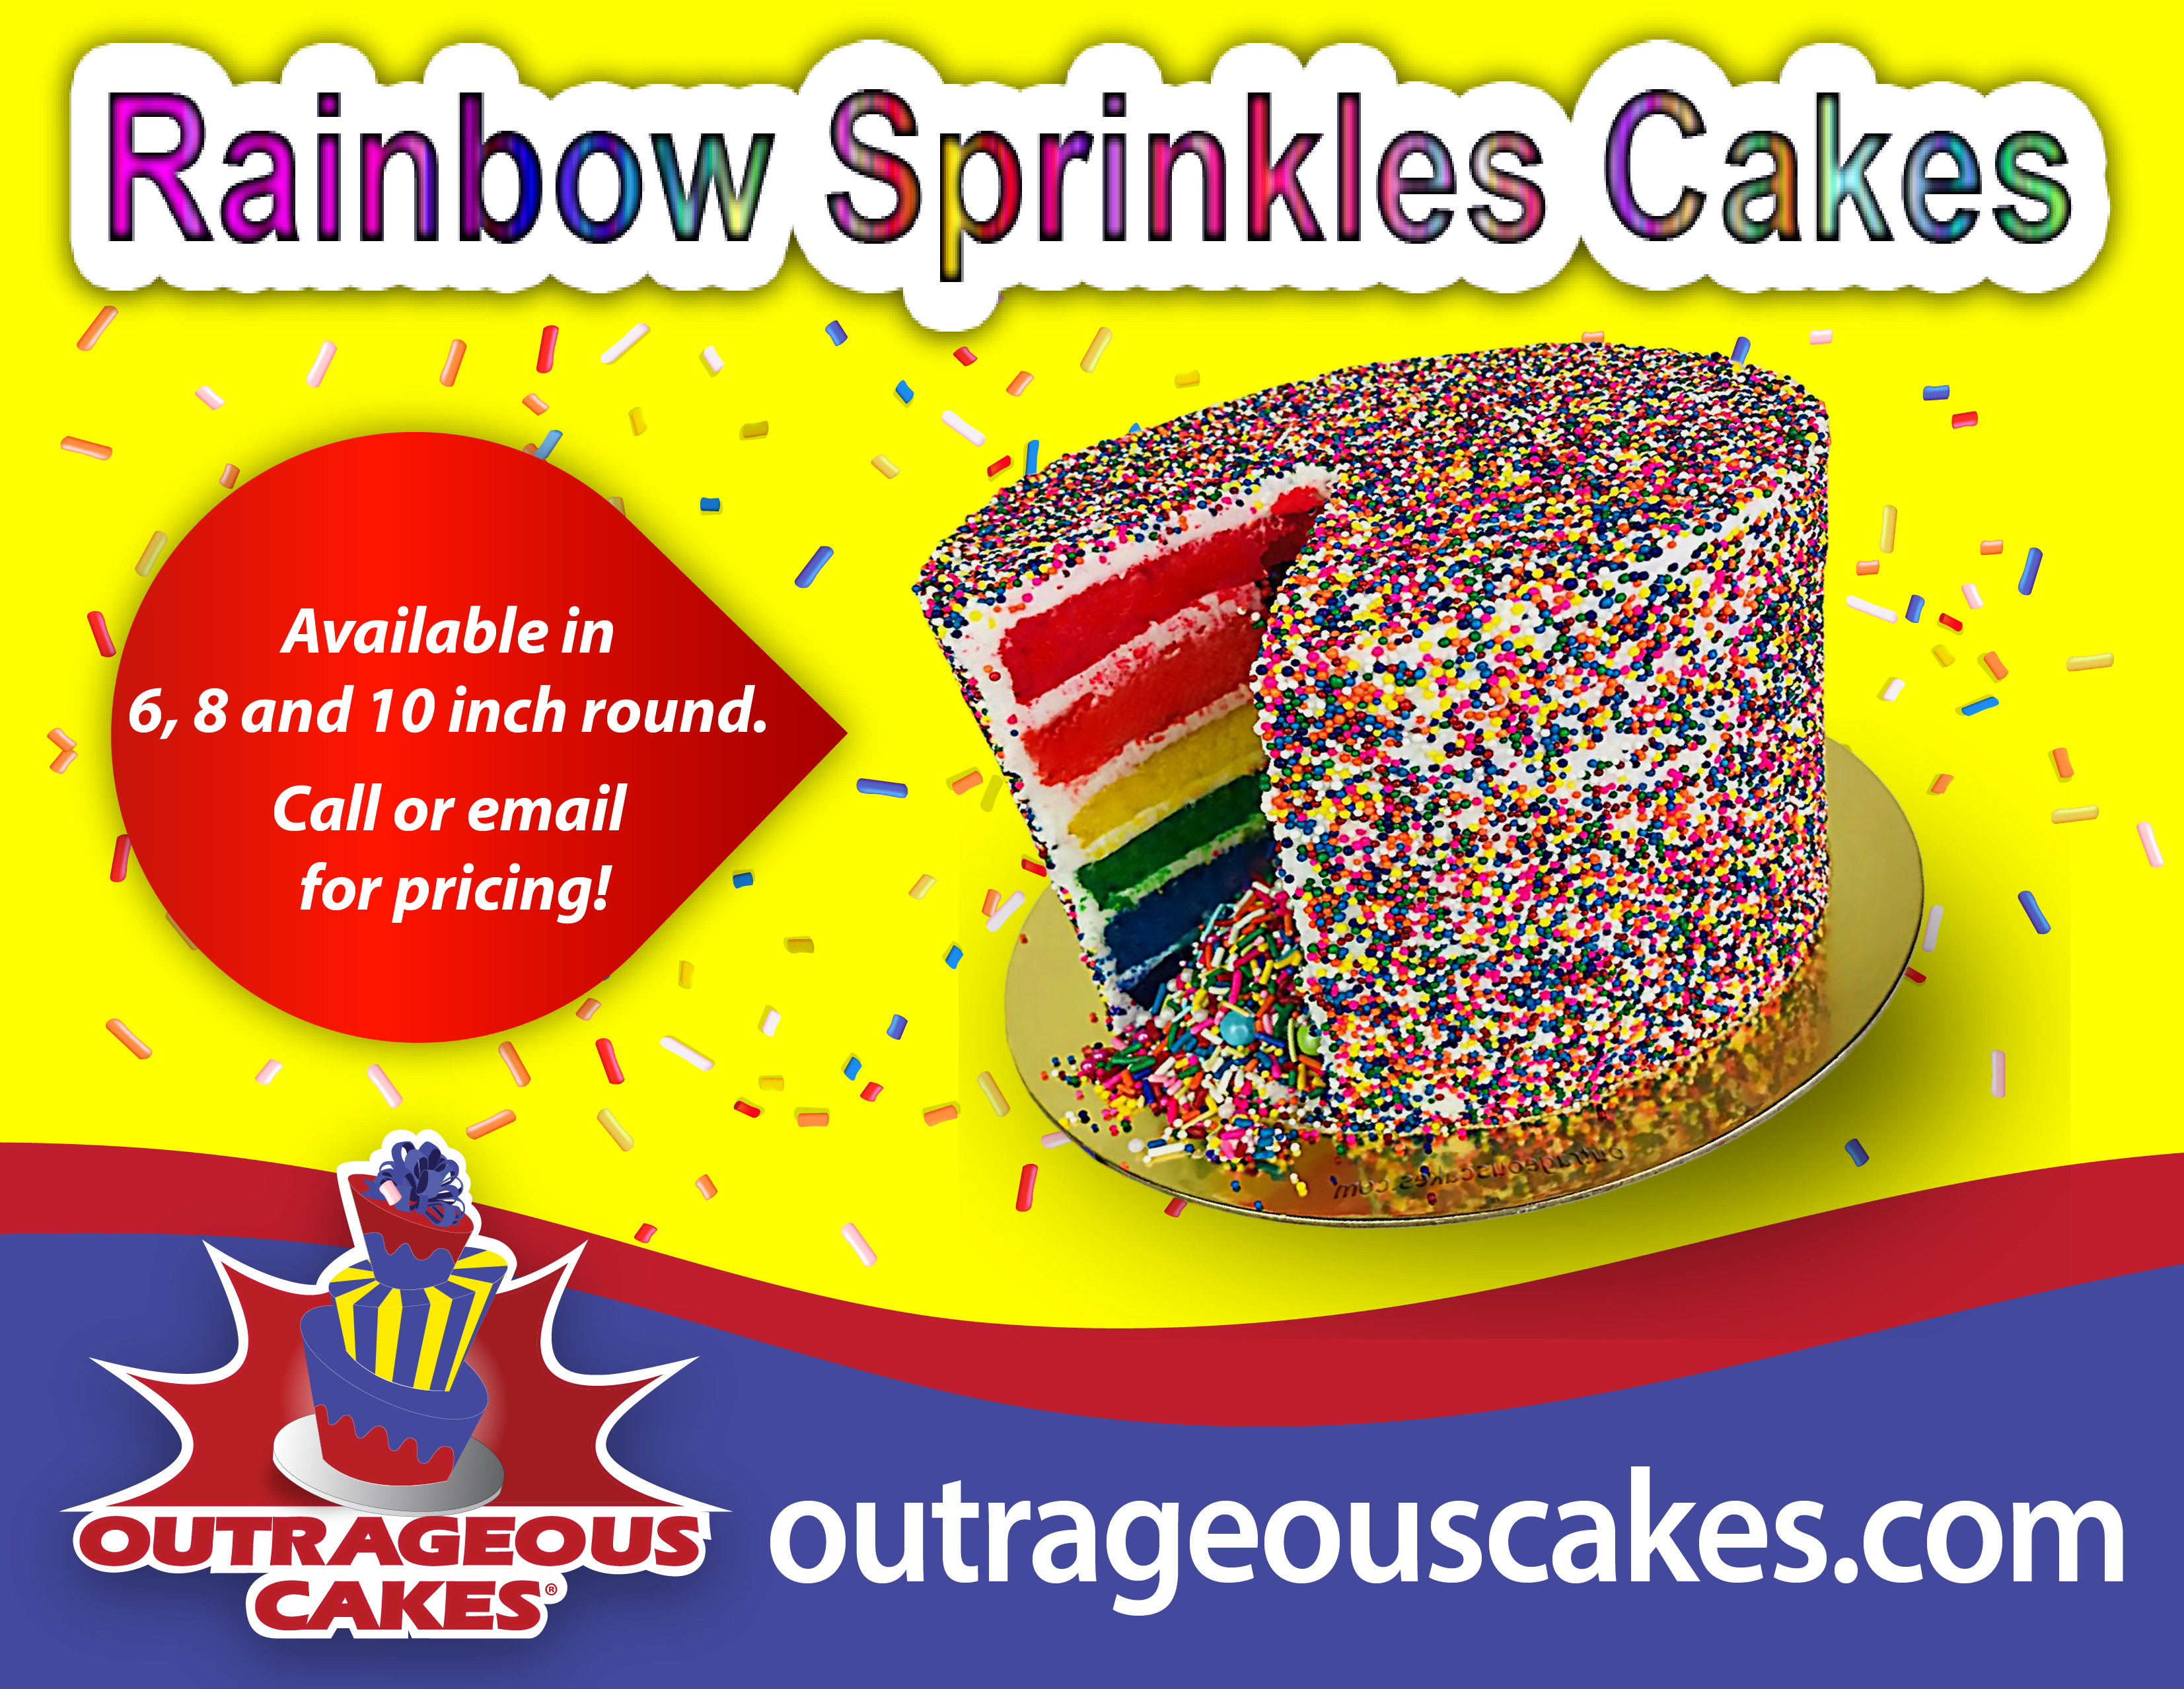 Rainbow Sprinkles Cakes